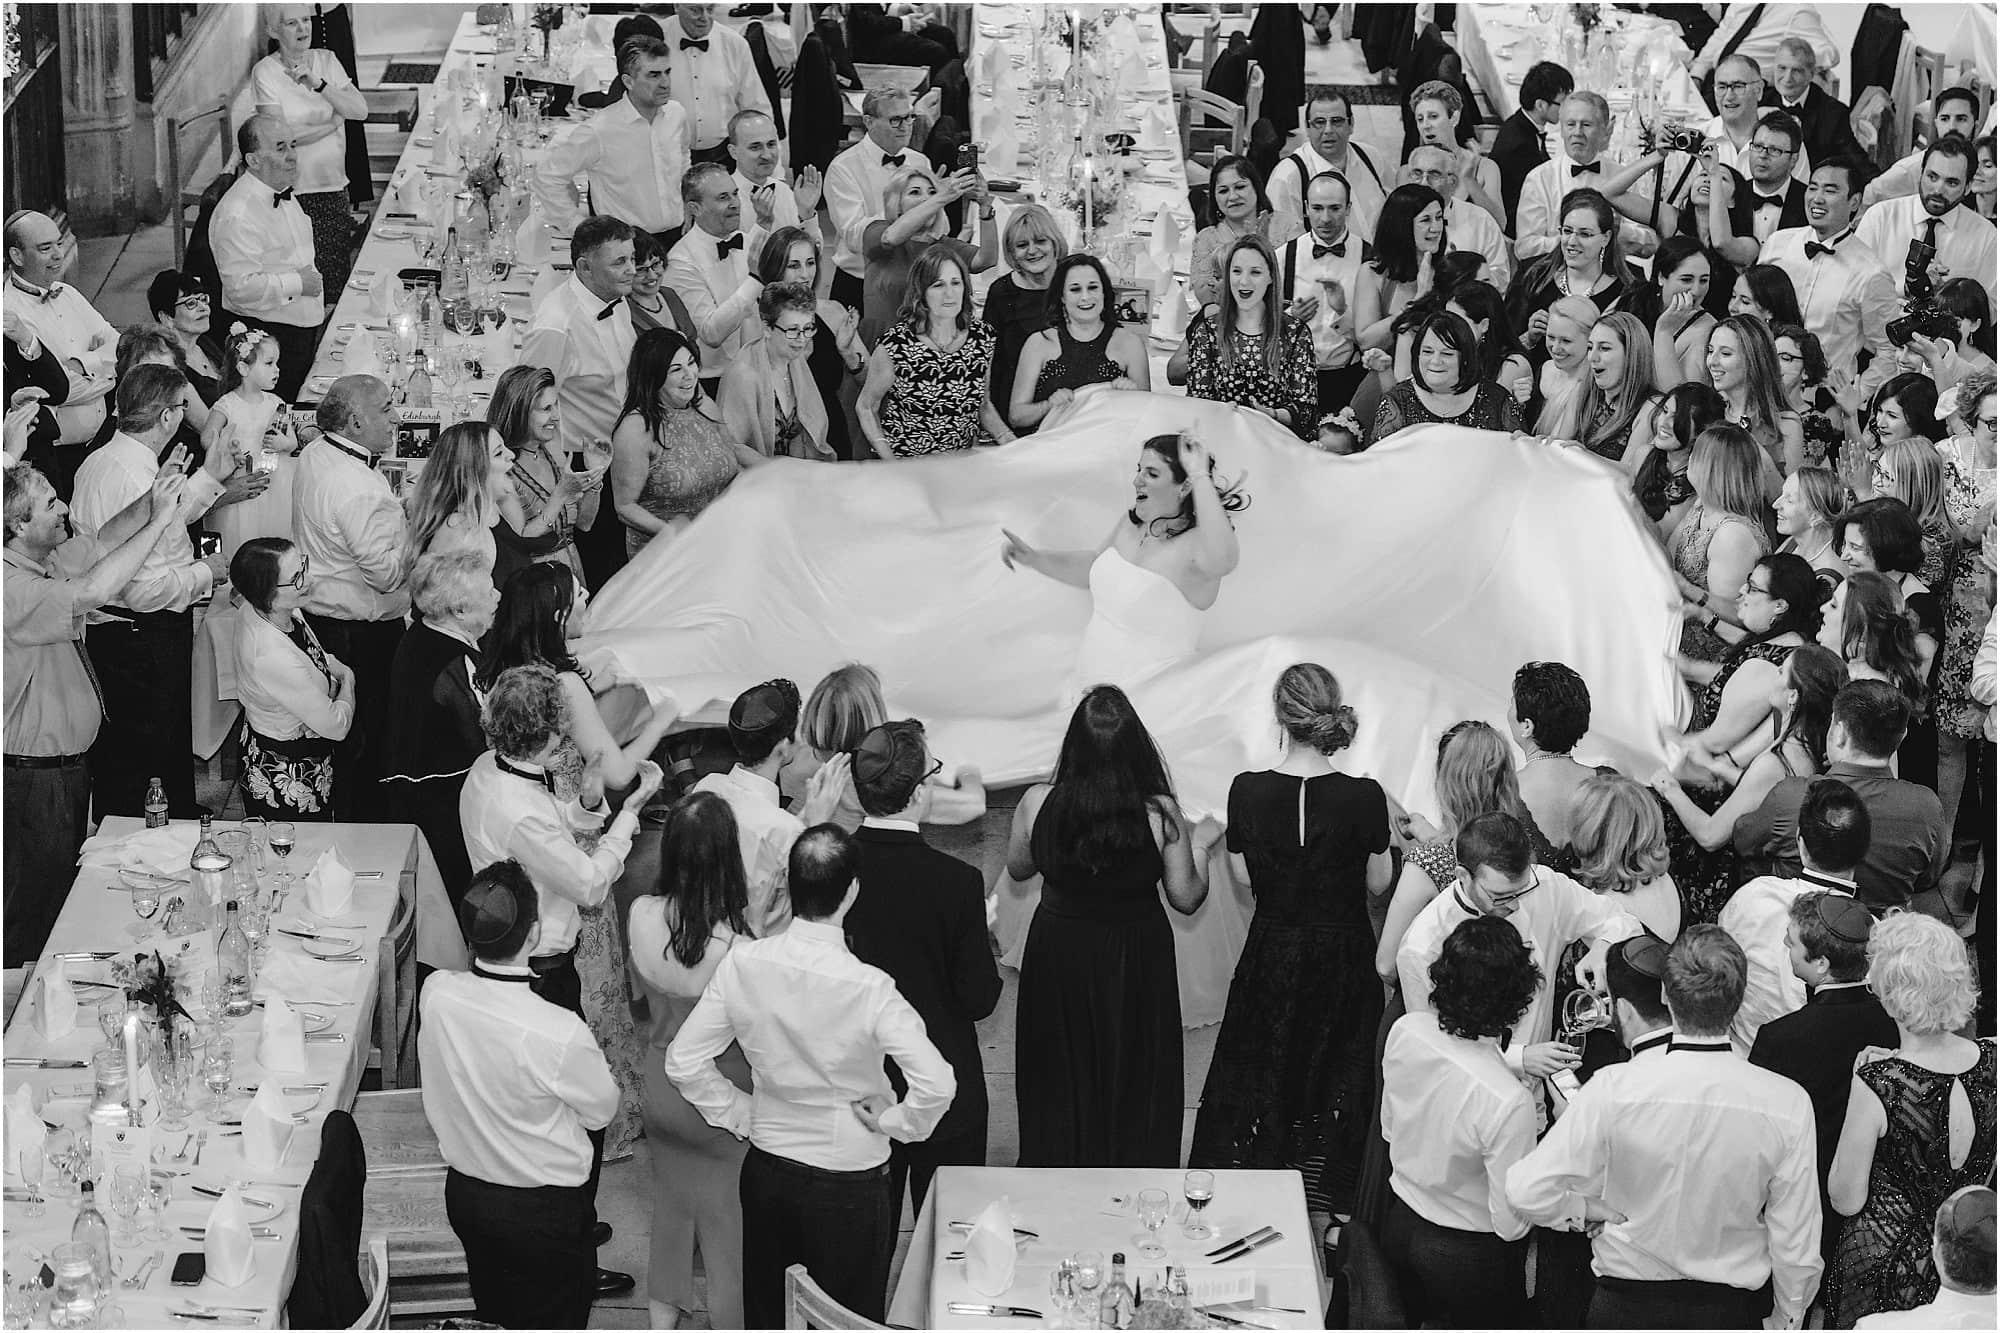 Israeli dancing bride wide dress